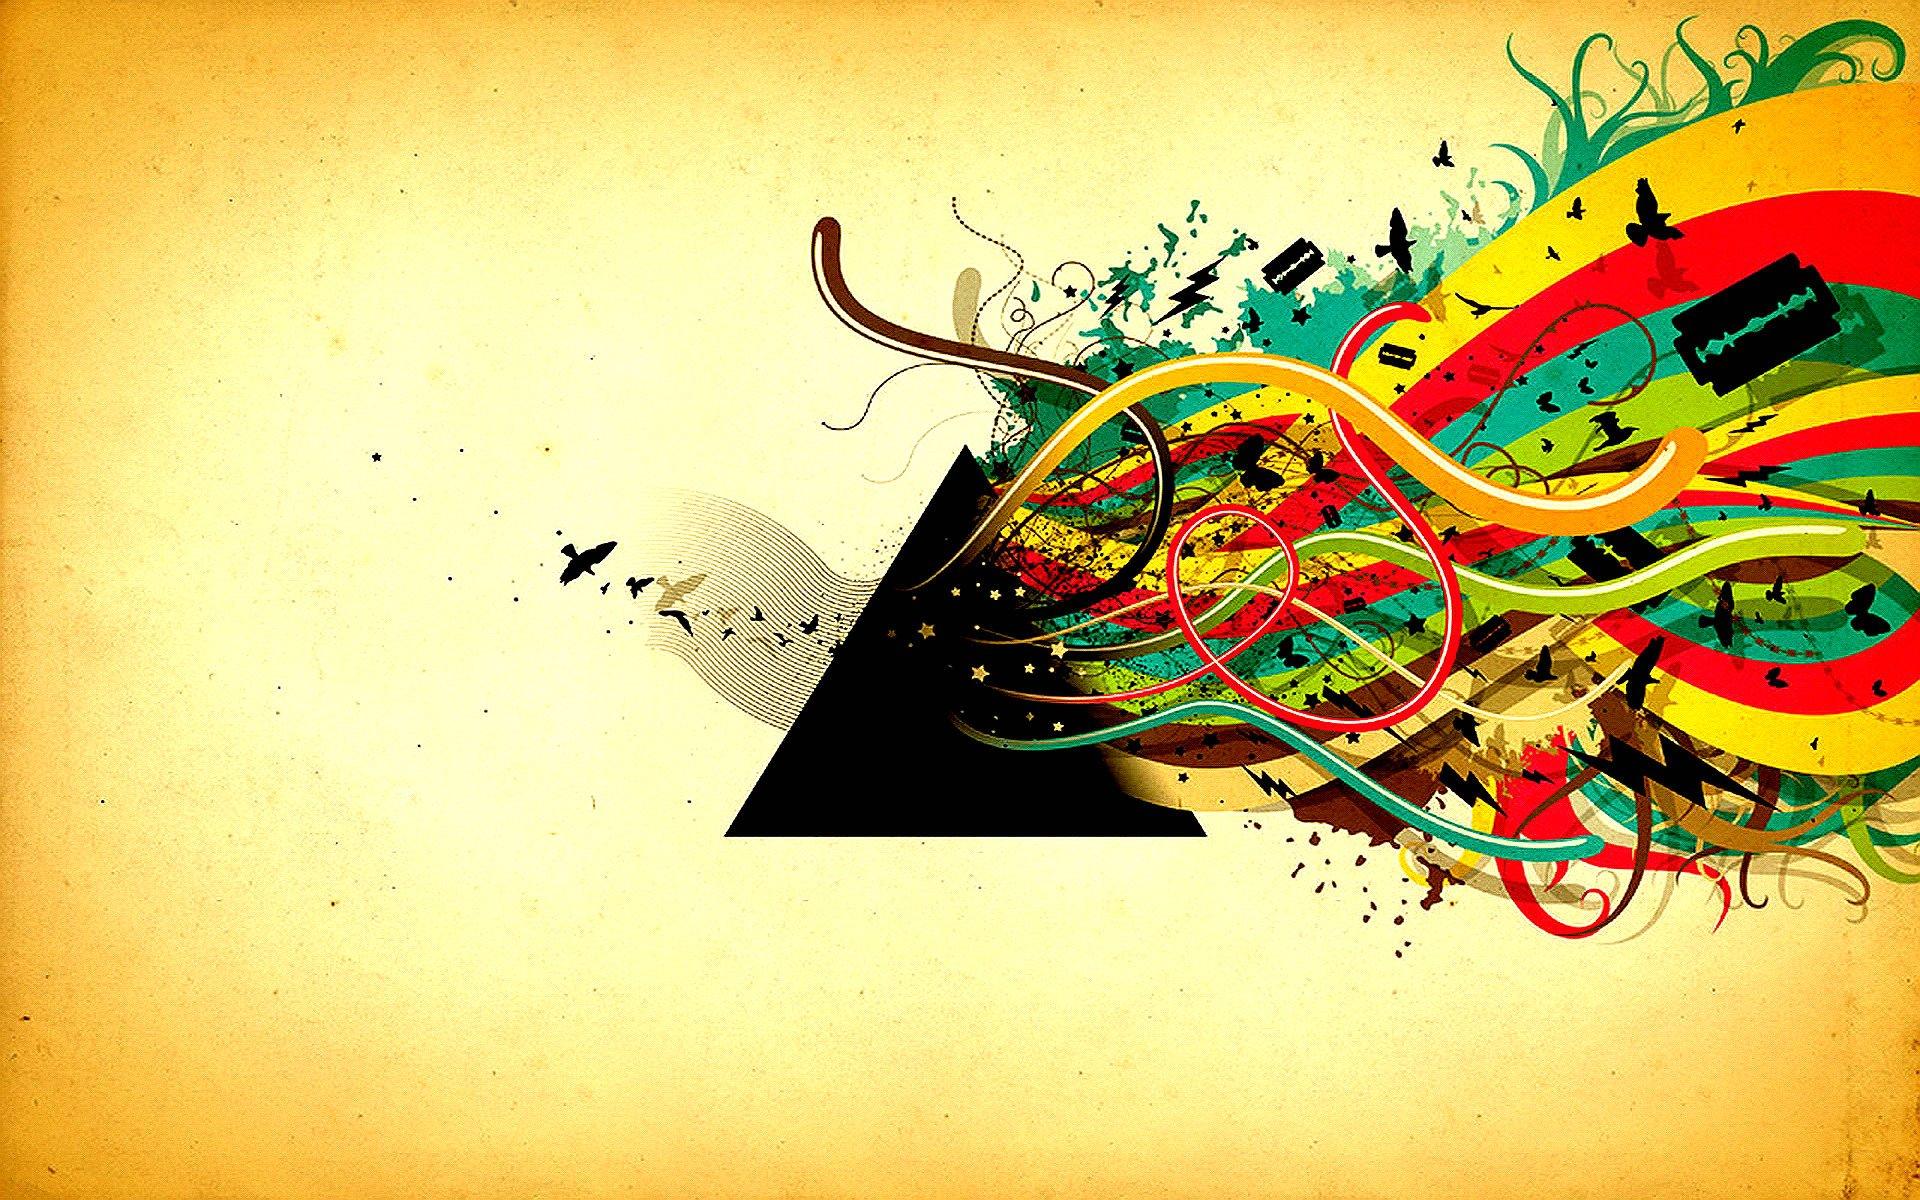 Beautiful Wallpaper Music Trippy - bac4d2eff162ee4183ce6511de55b41f  Image_474644.jpg